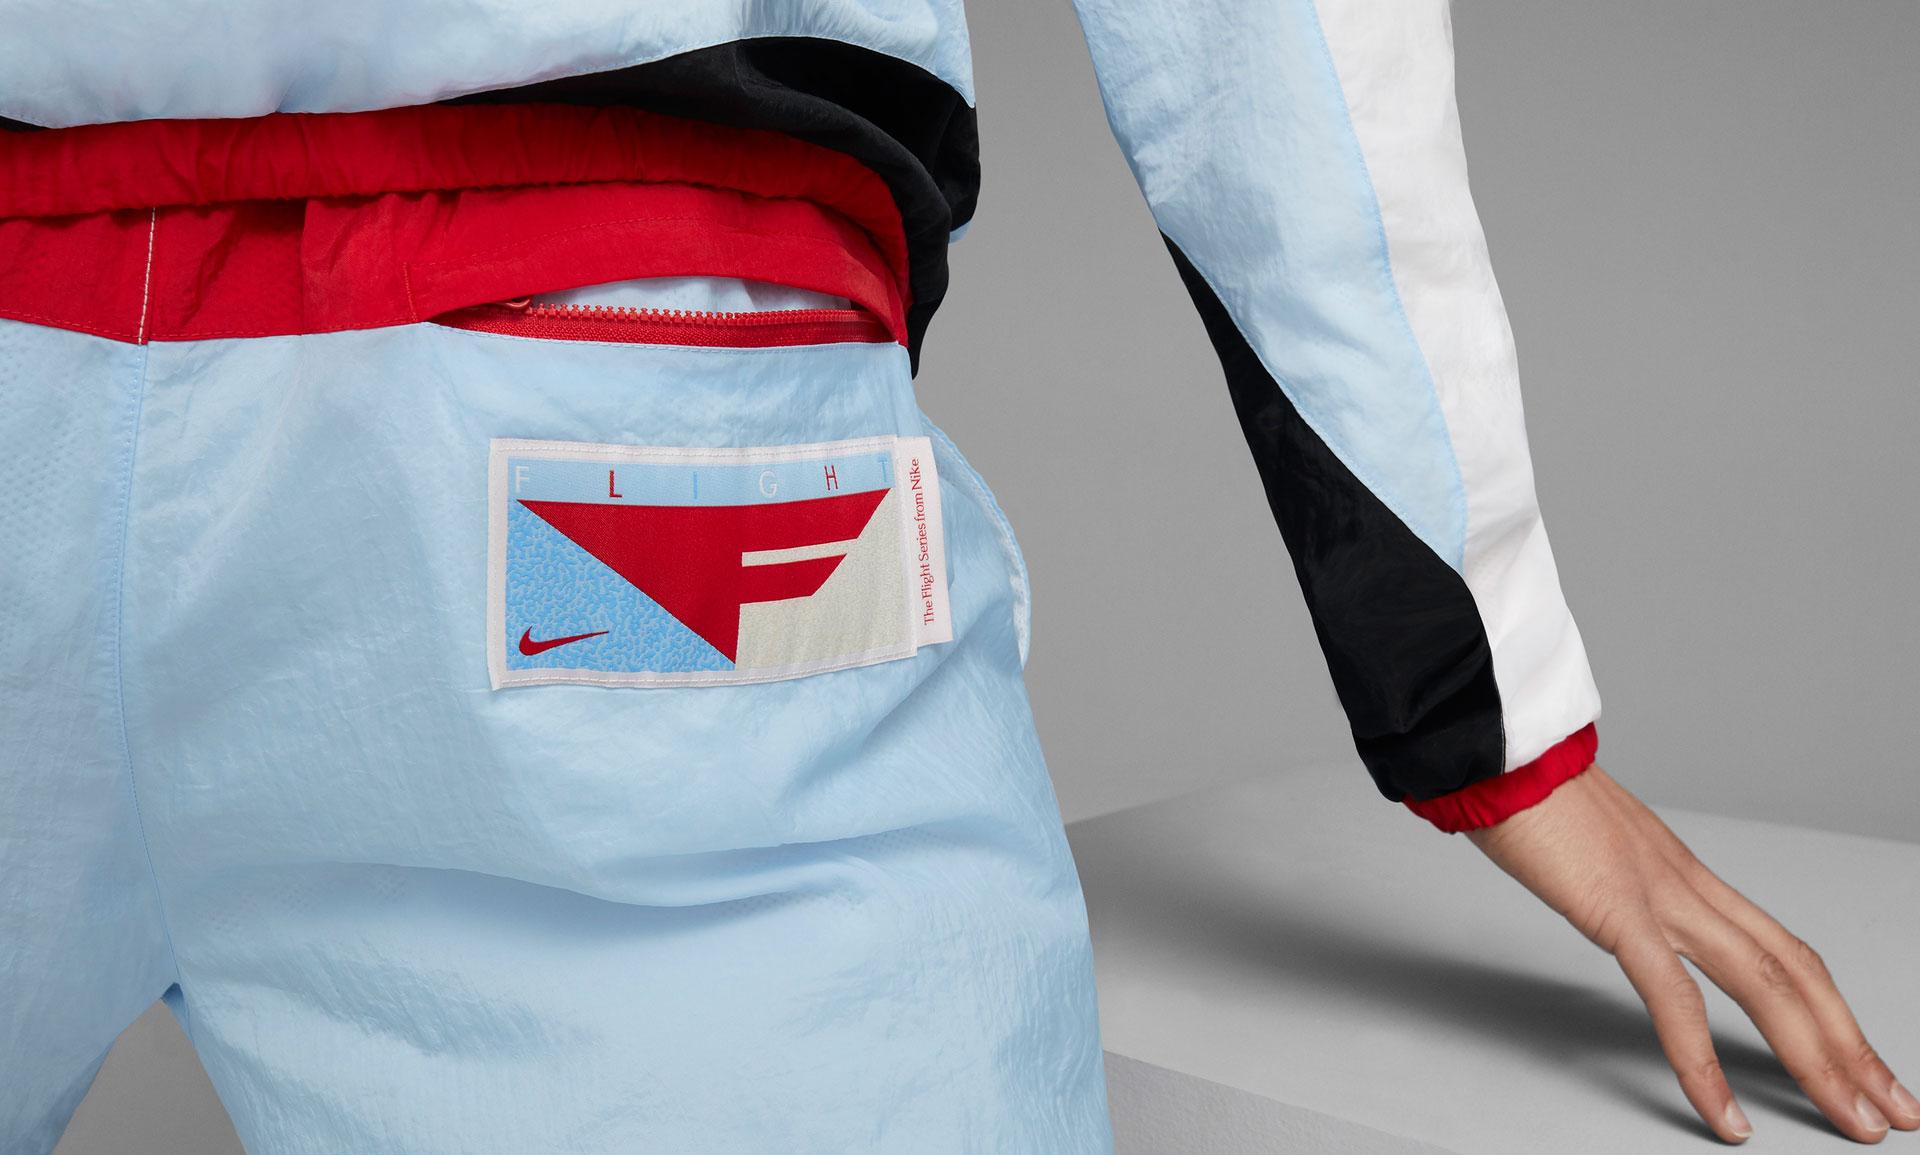 nike-flight-chicago-apparel-2